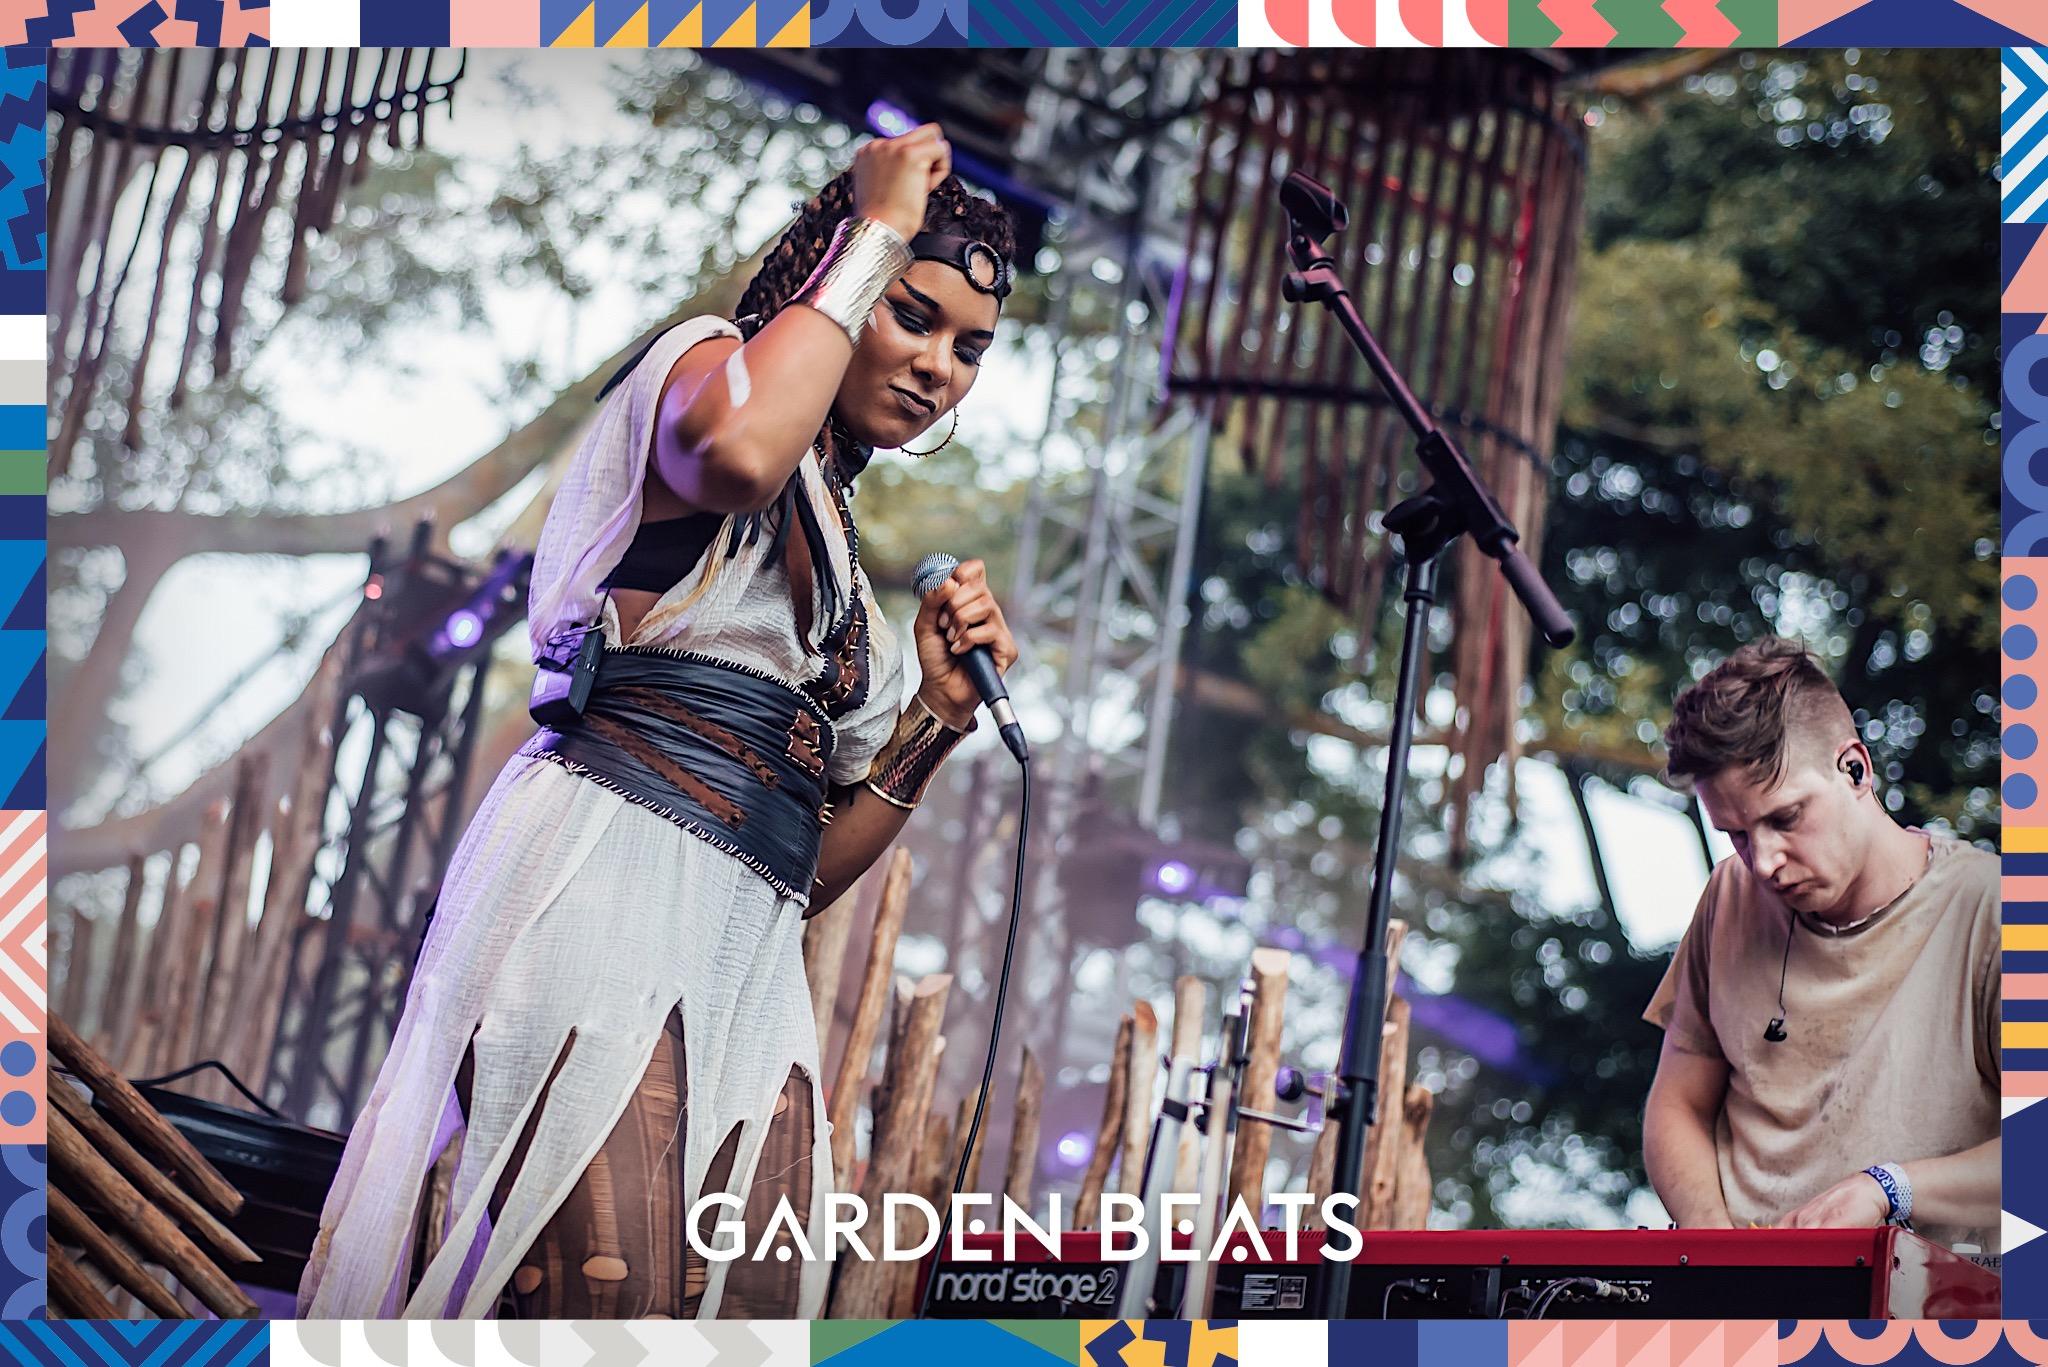 18032017_GardenBeats_Colossal654_WatermarkedGB.jpg